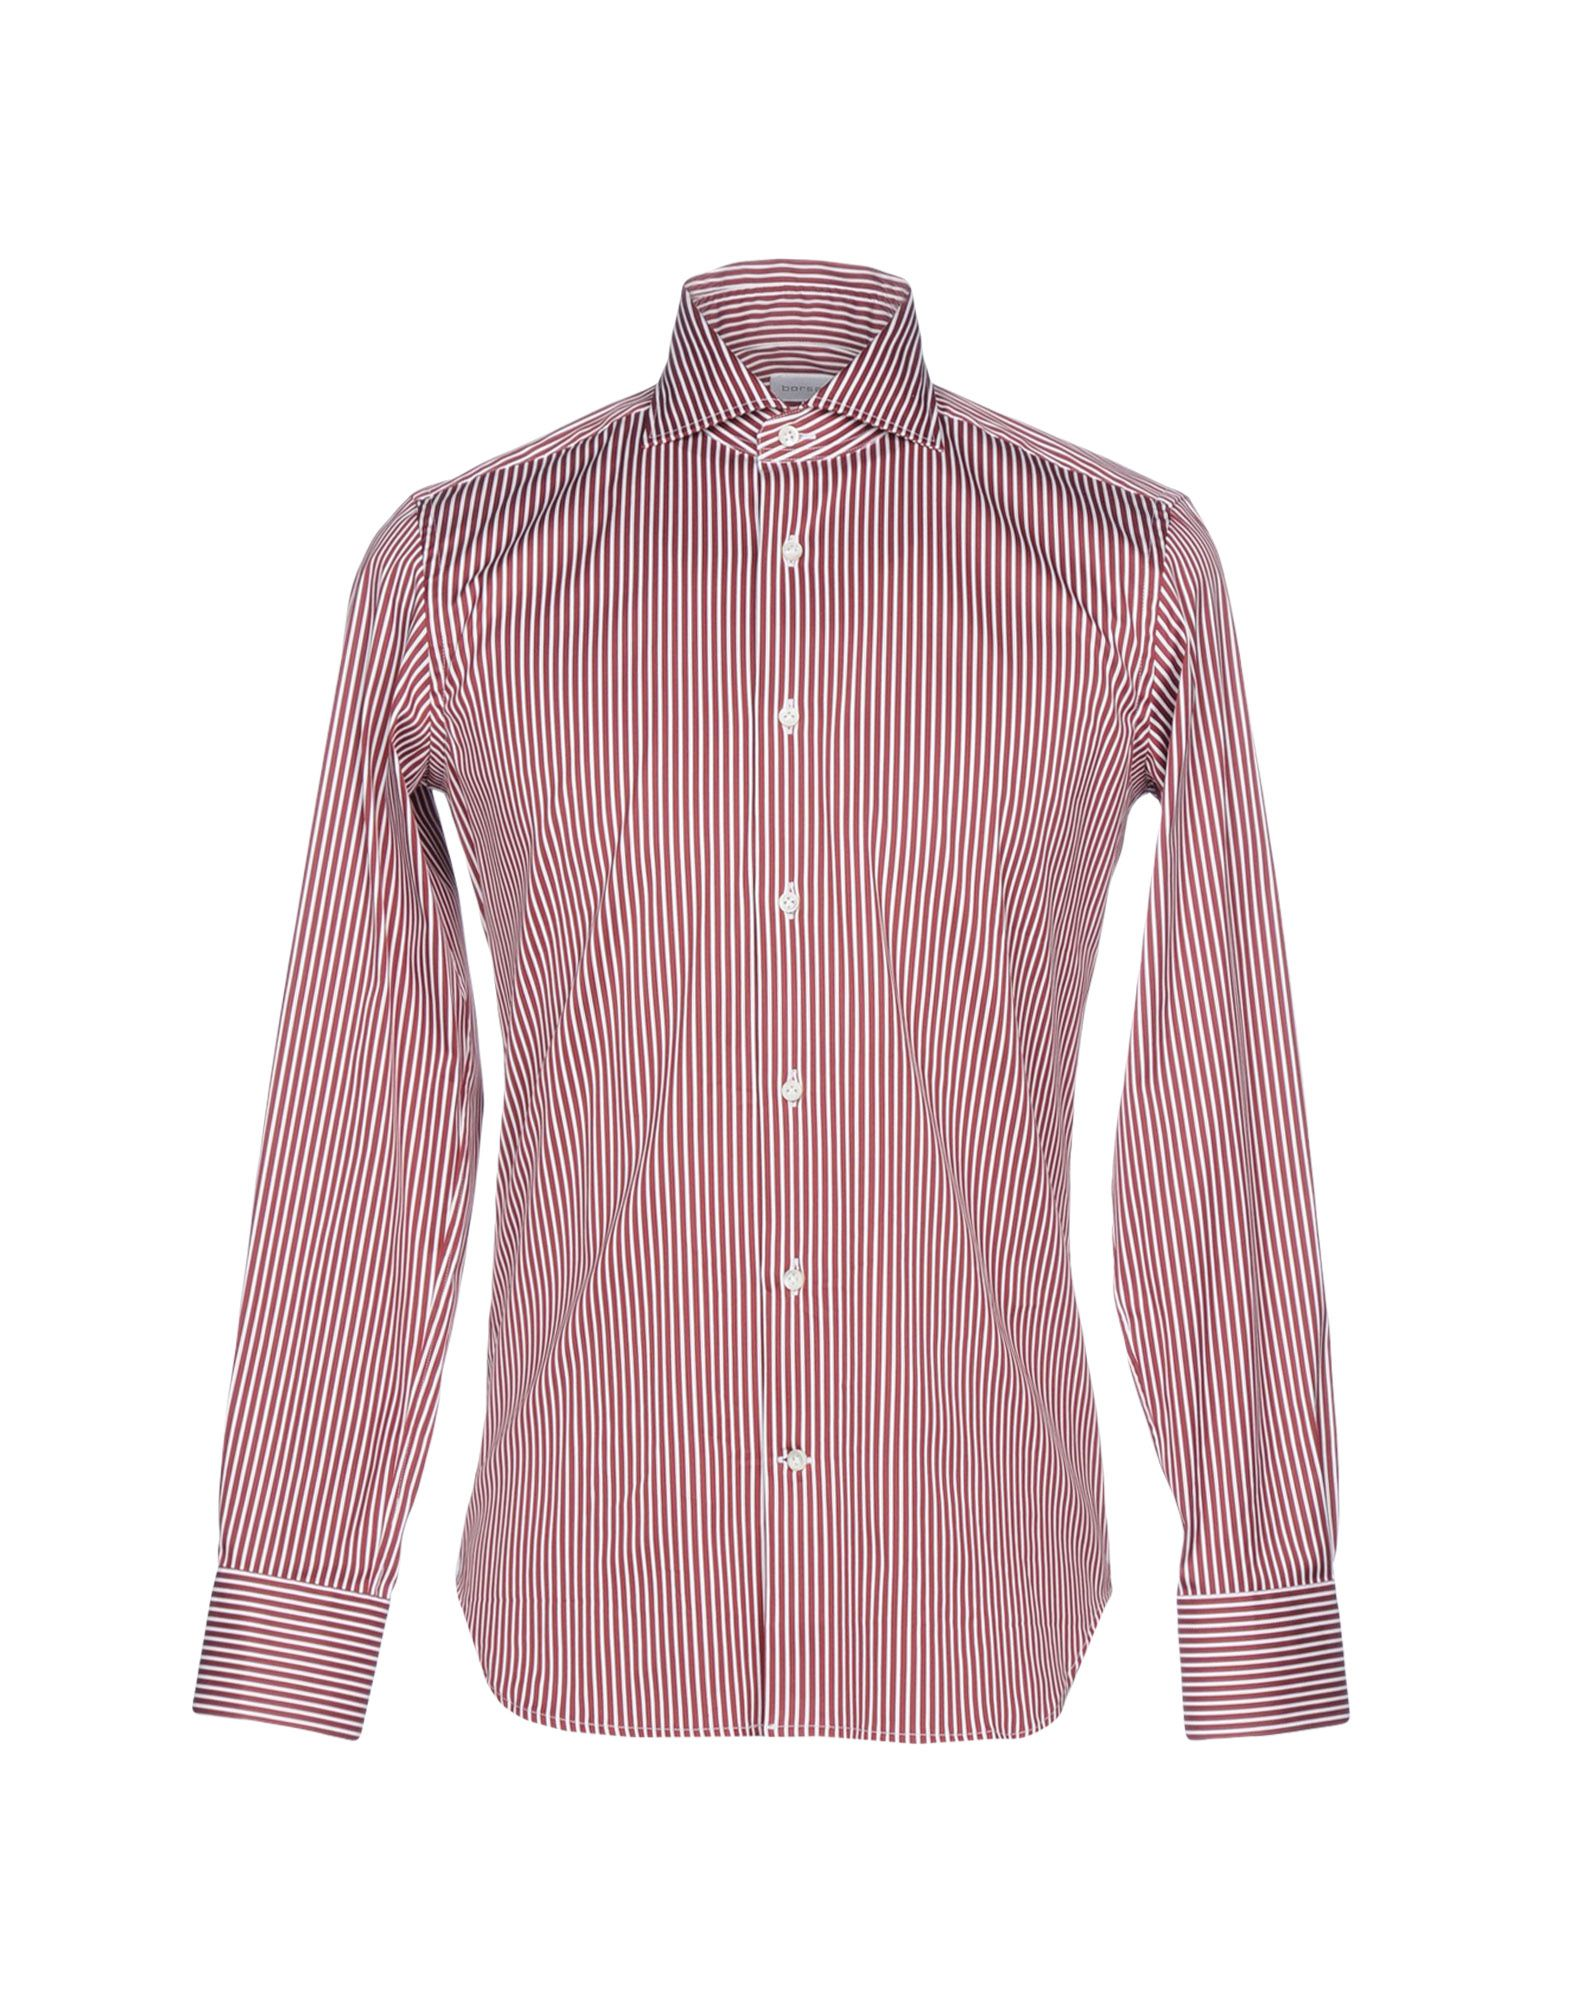 BORSA Striped Shirt in Maroon